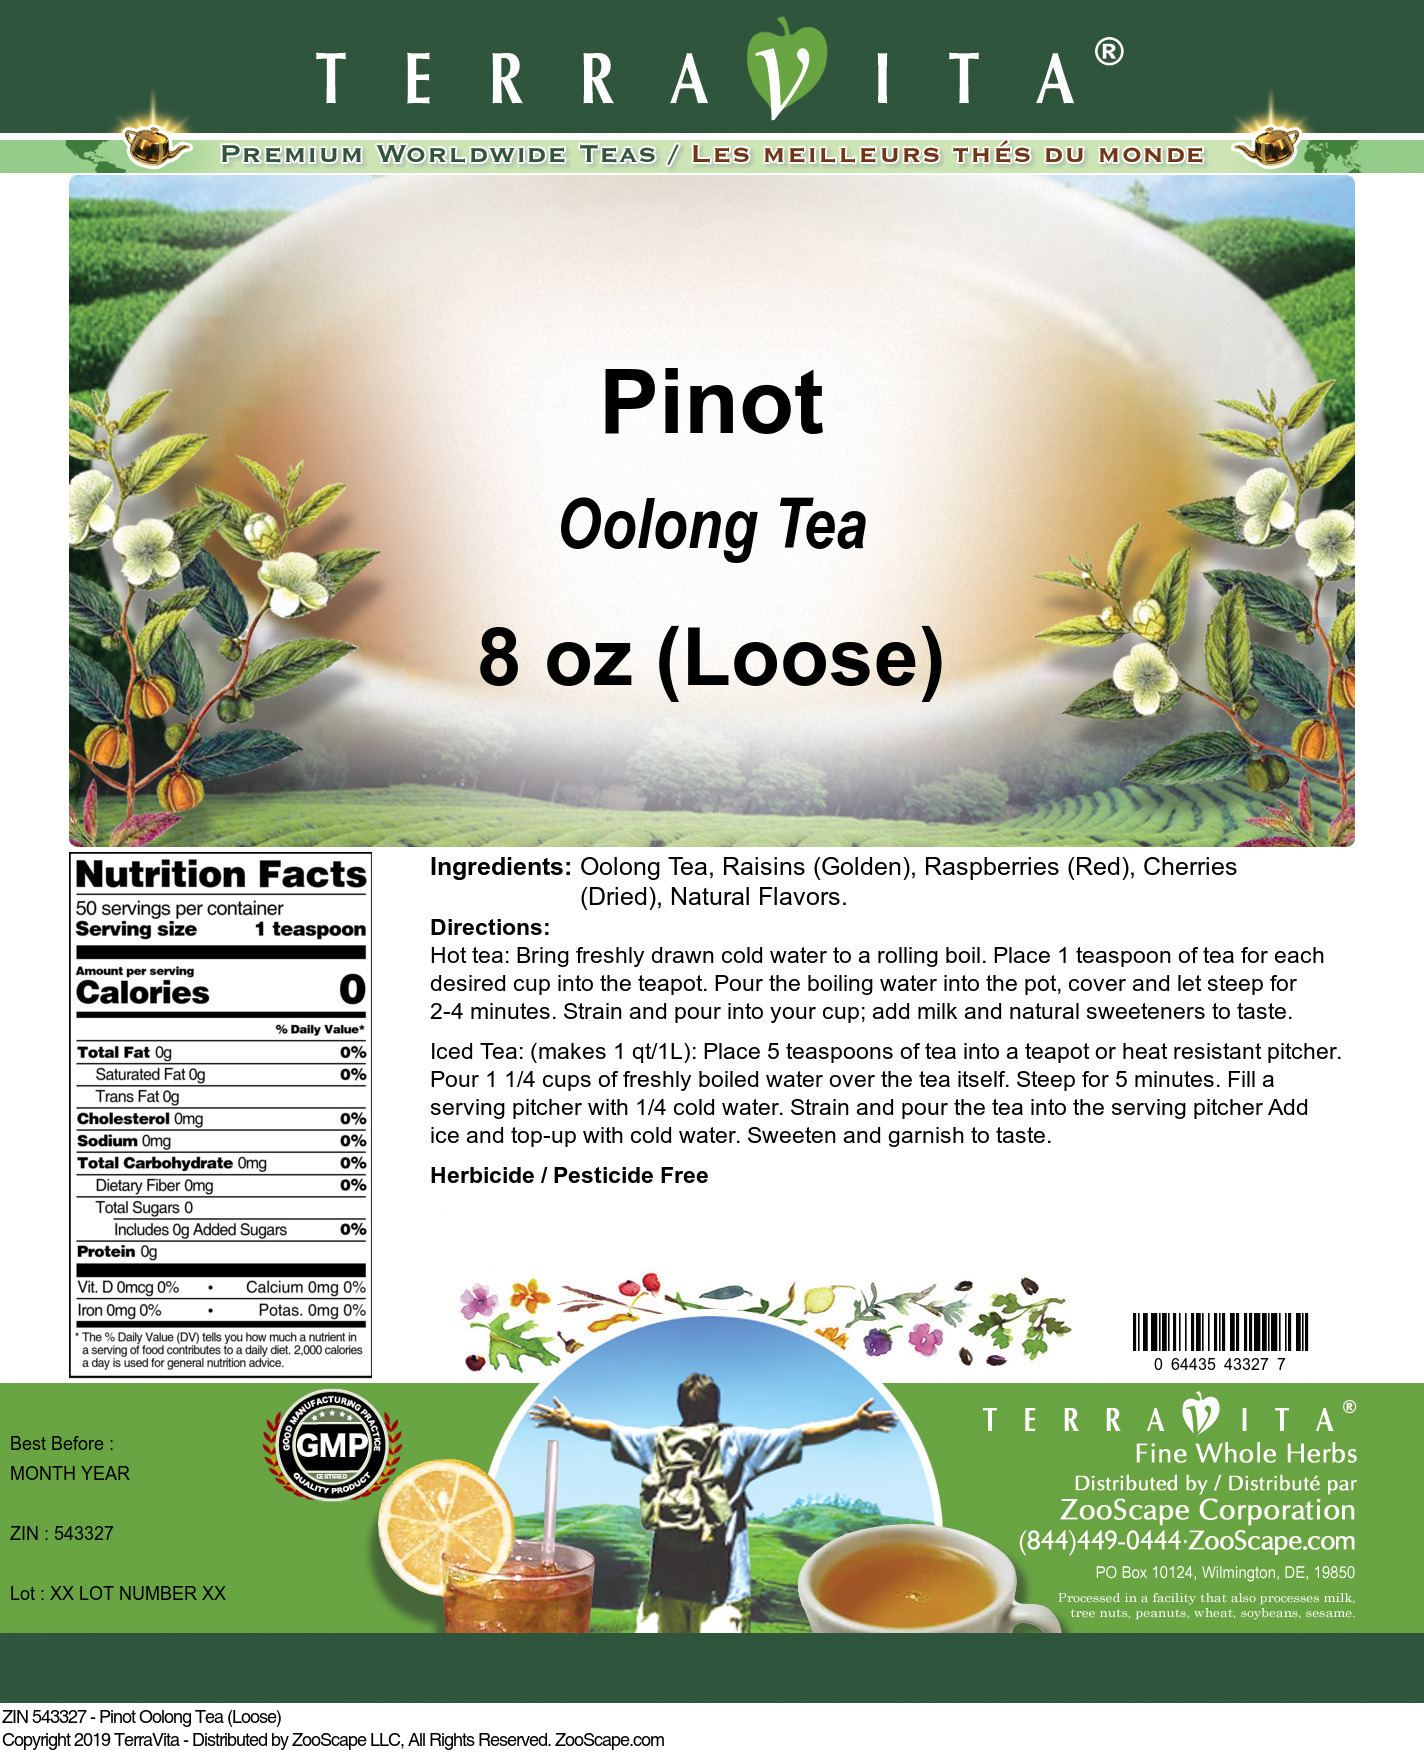 Pinot Oolong Tea